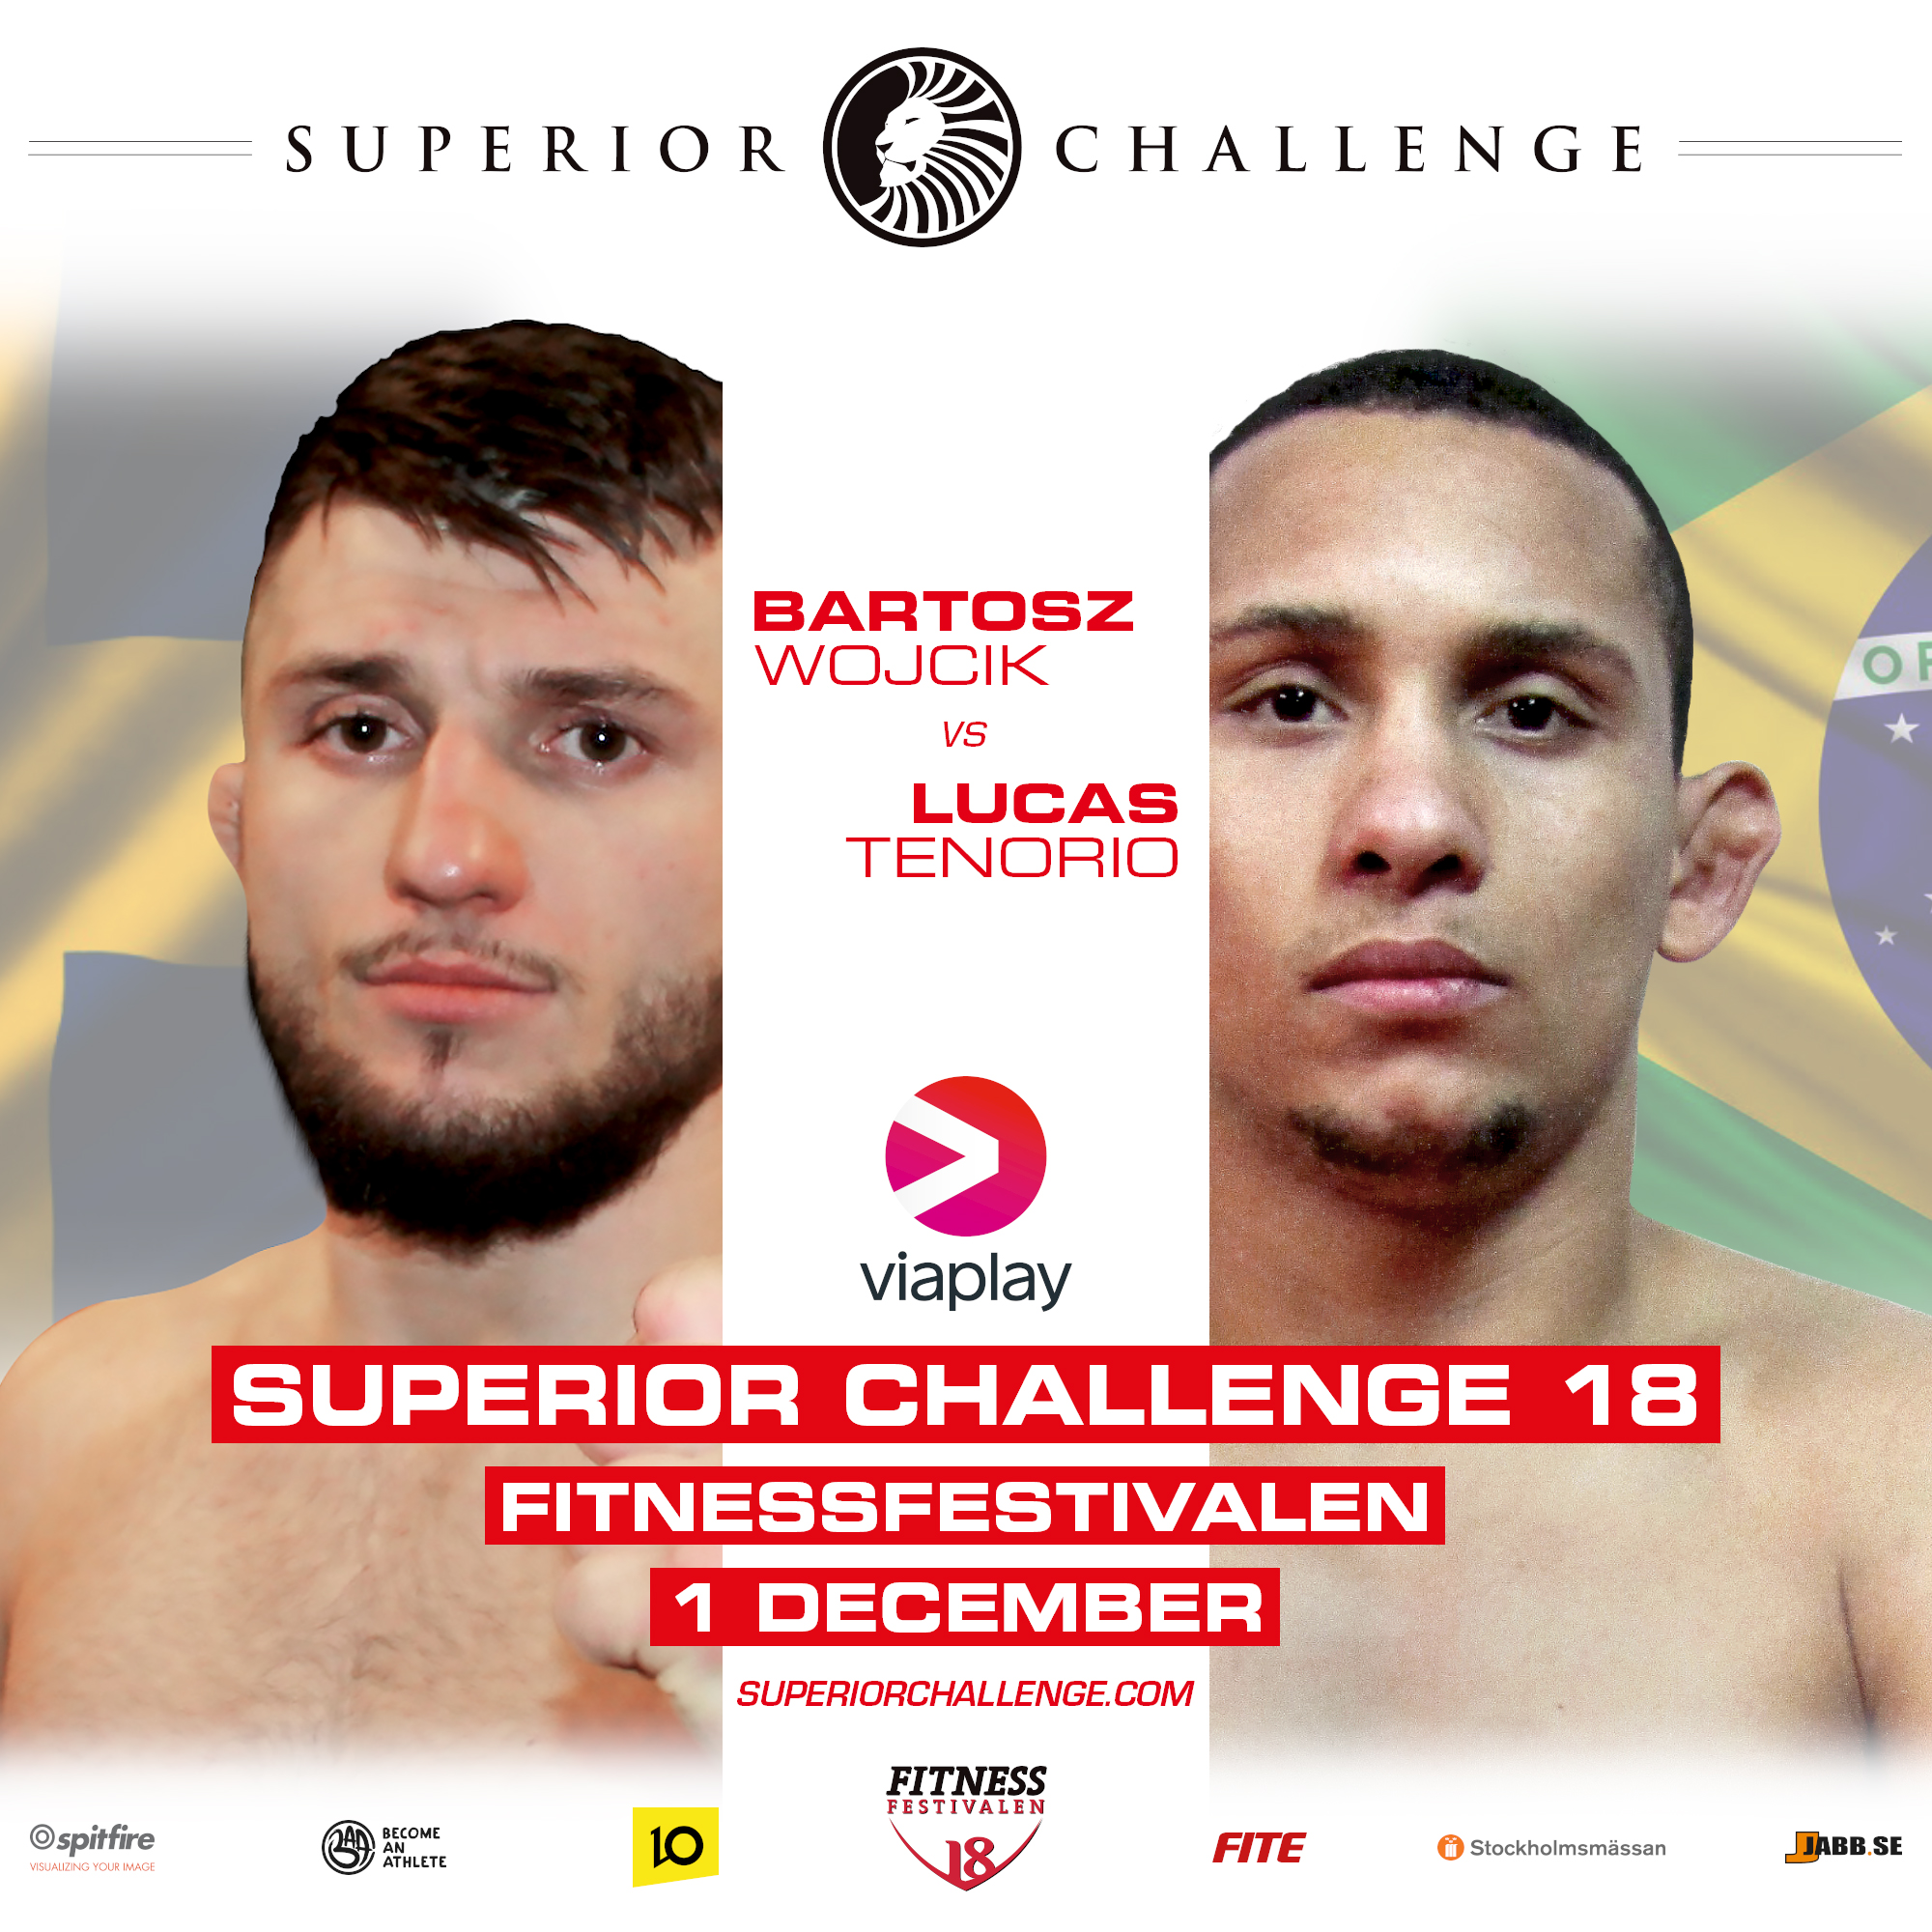 Bartosz Wojcik vs Lucas Tenorio Superior Challenge 18 Fitnessfestivalen